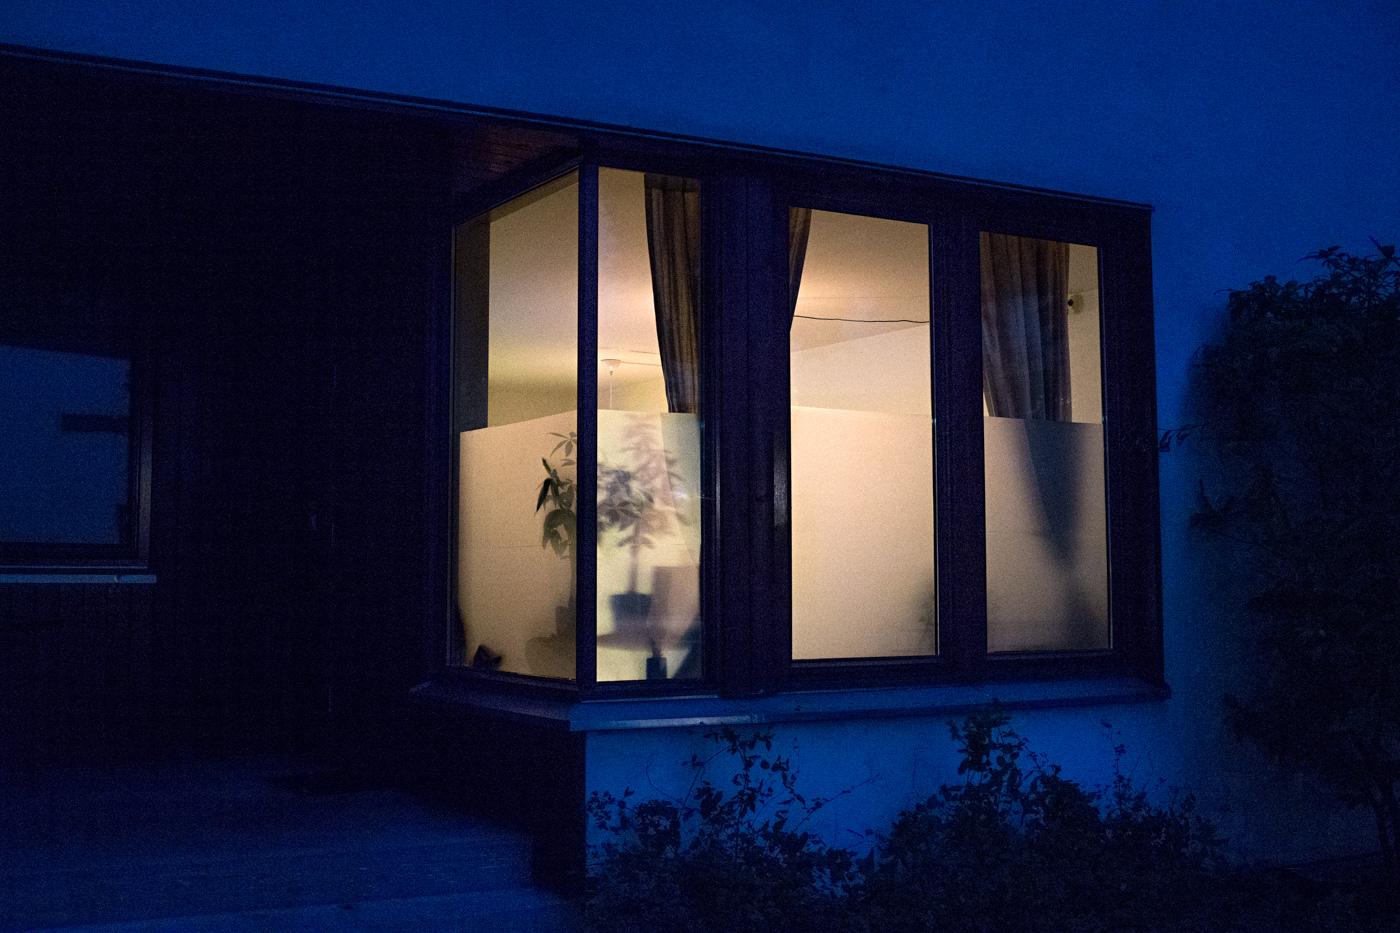 Window, Lille Bislett, 2018/2019, Archival inkjet print, 30 x 45 cm